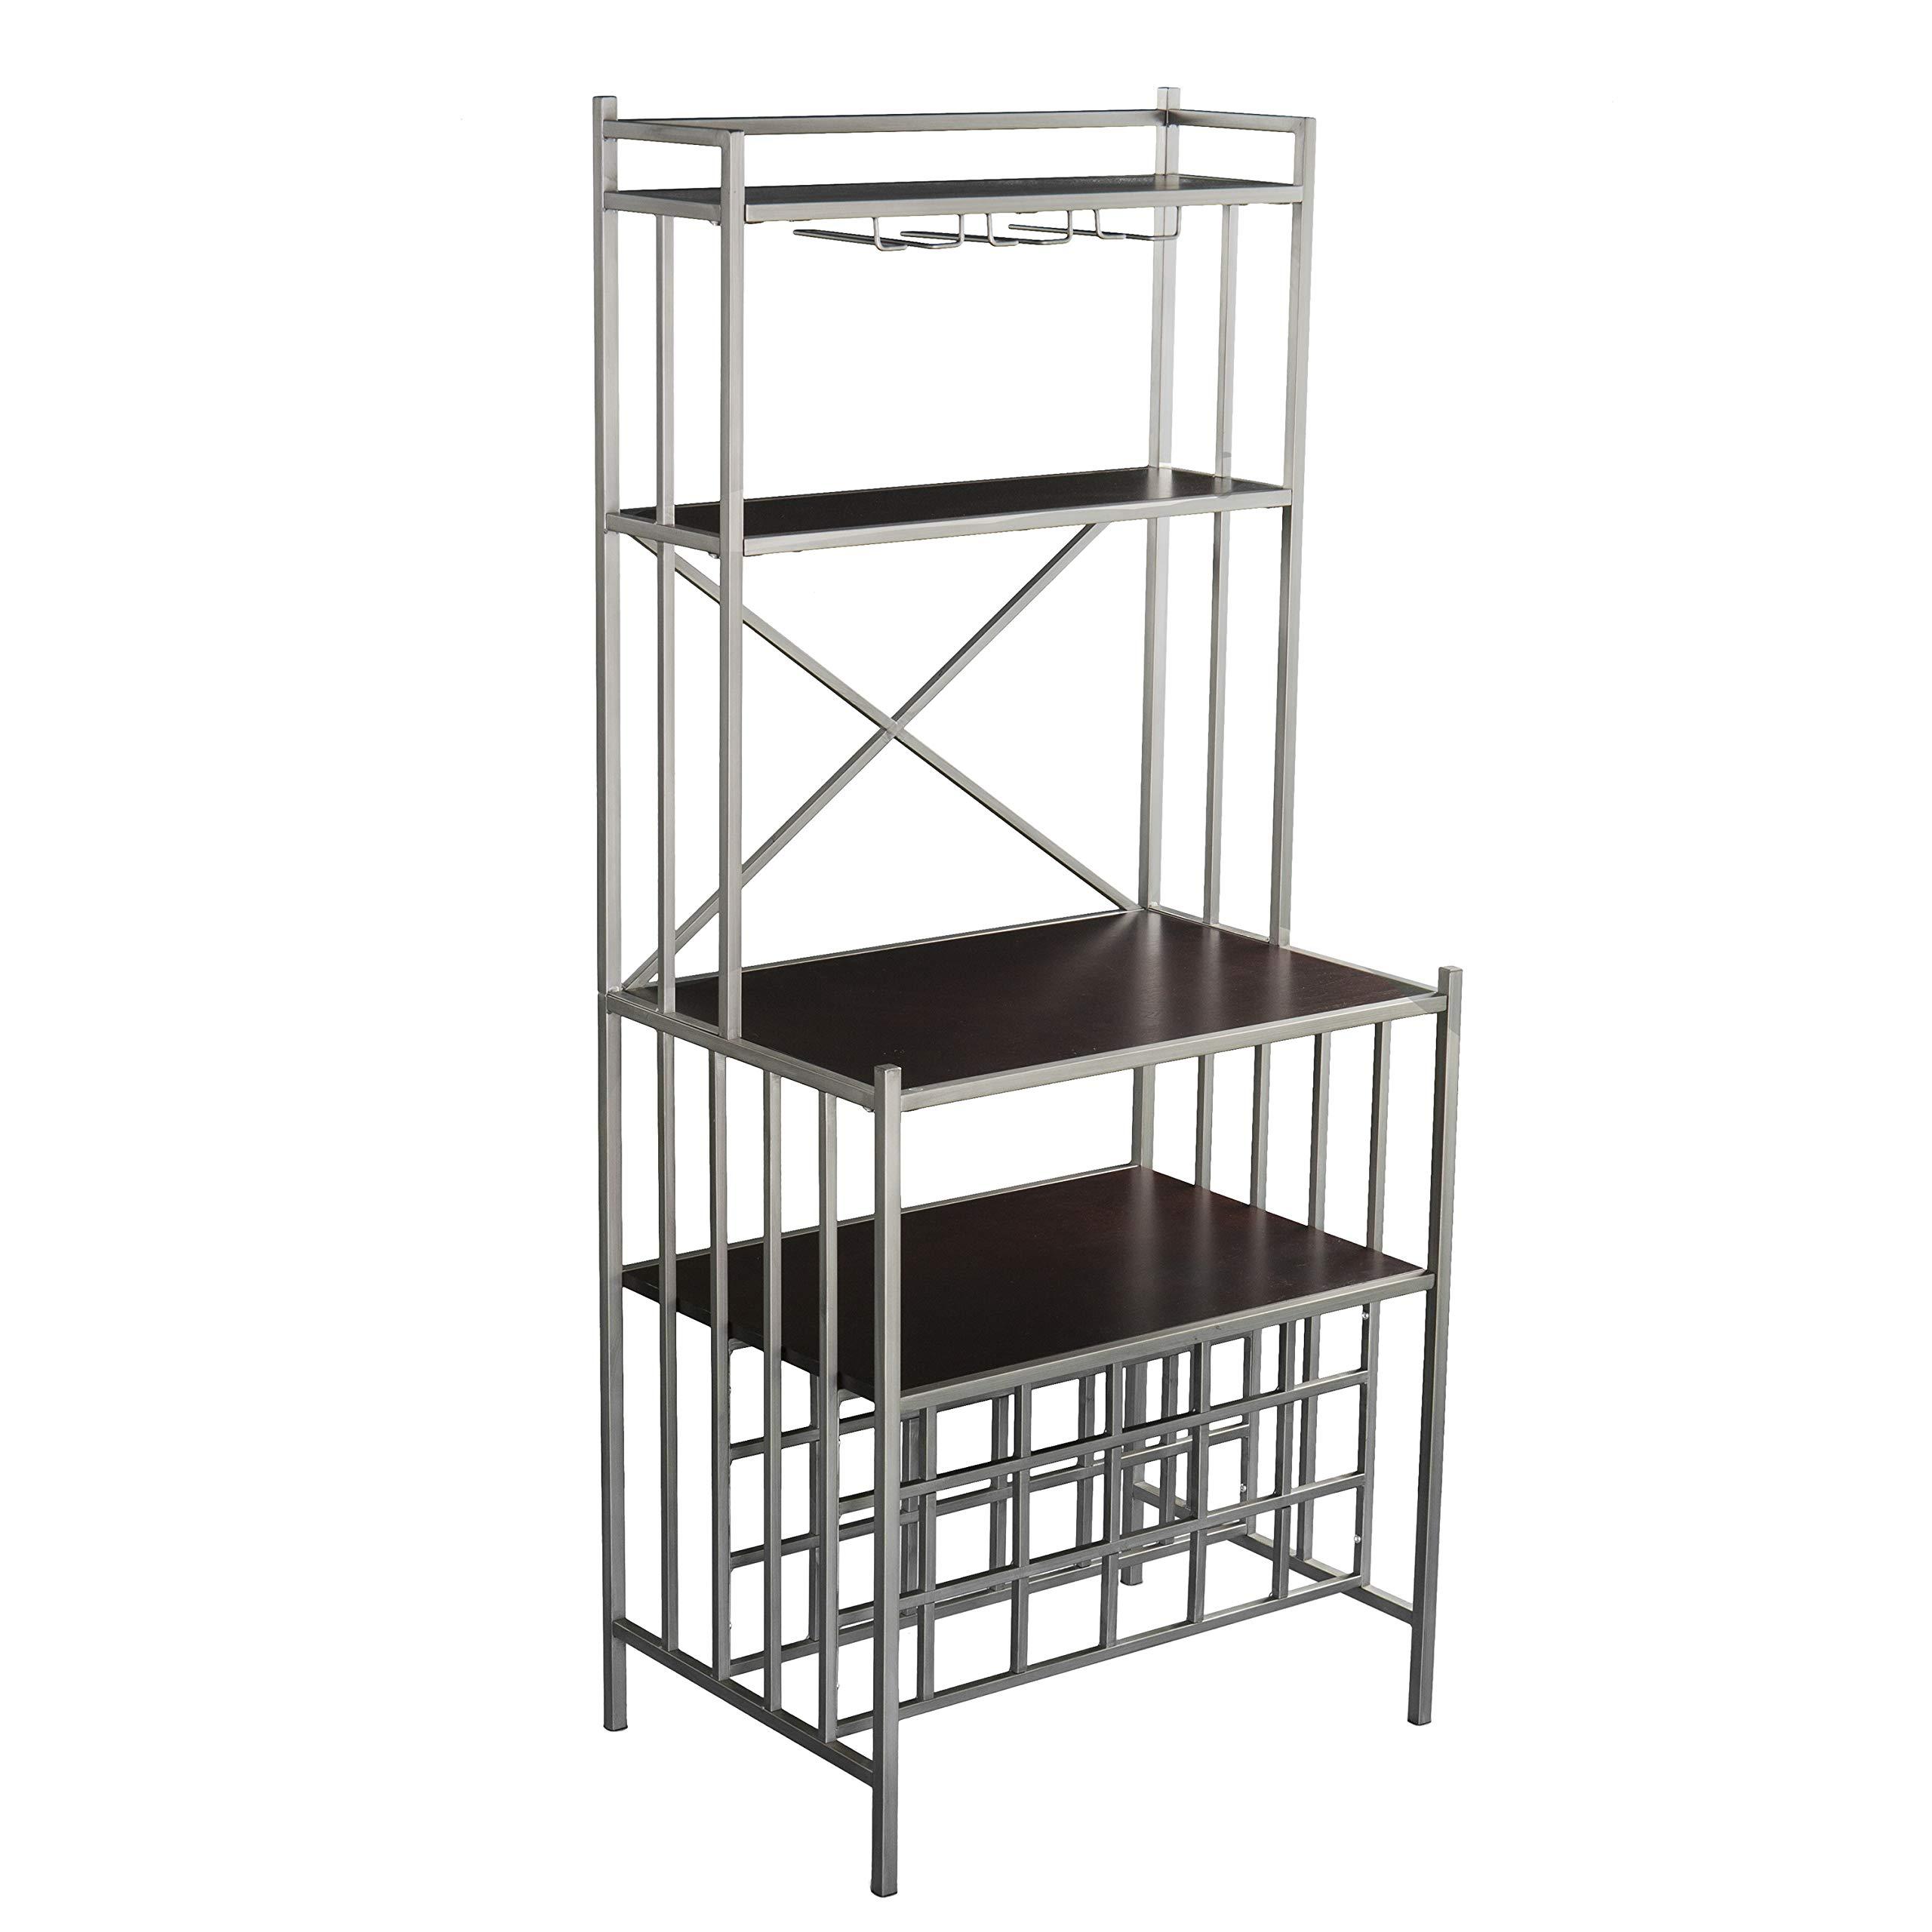 Furniture HotSpot Metal Bakers Rack - Industrial Backers Stand - Metal Frame w/Shelves (Silver Frame w/Wood Shelves)